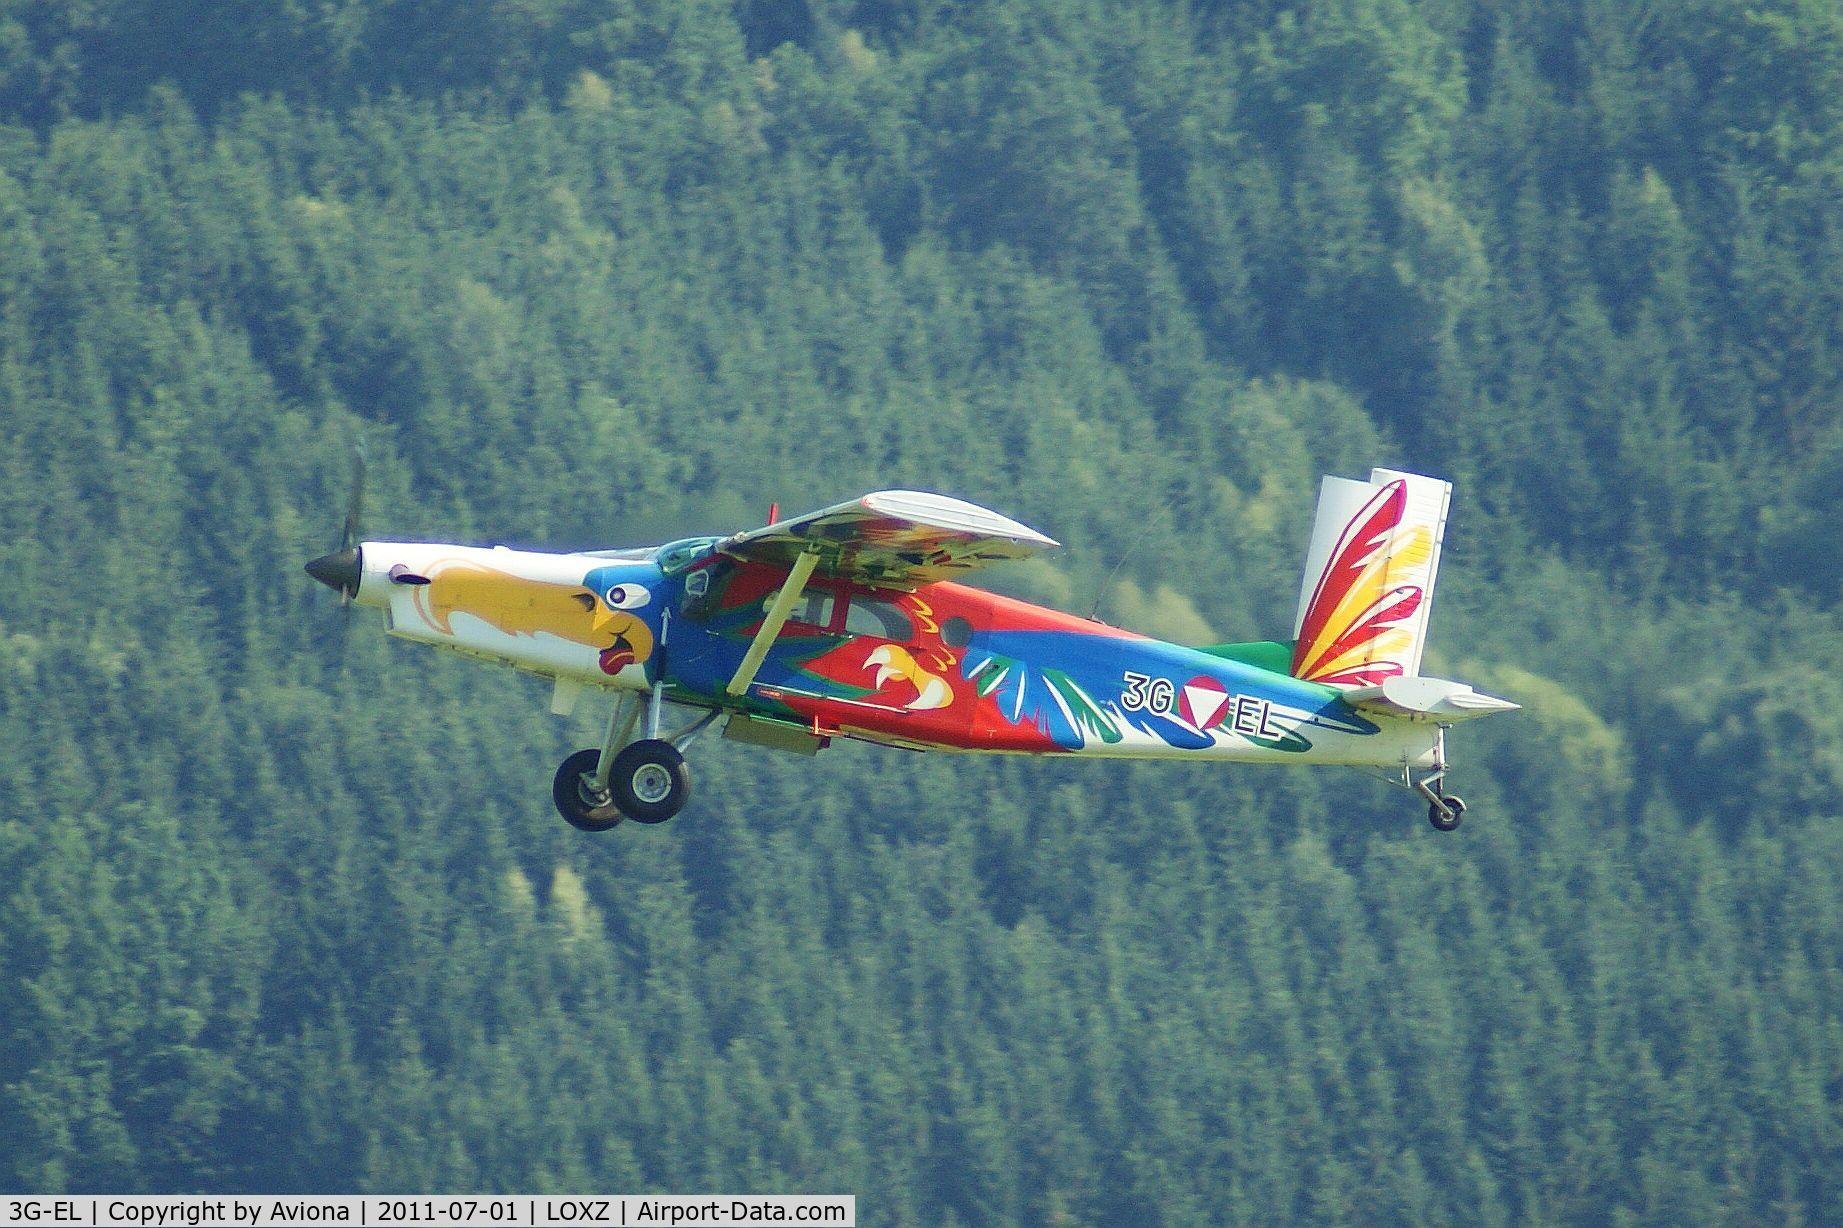 3G-EL, 1976 Pilatus PC-6/B2-H2 Turbo Porter C/N 777, 3G-EL @ LOXZ